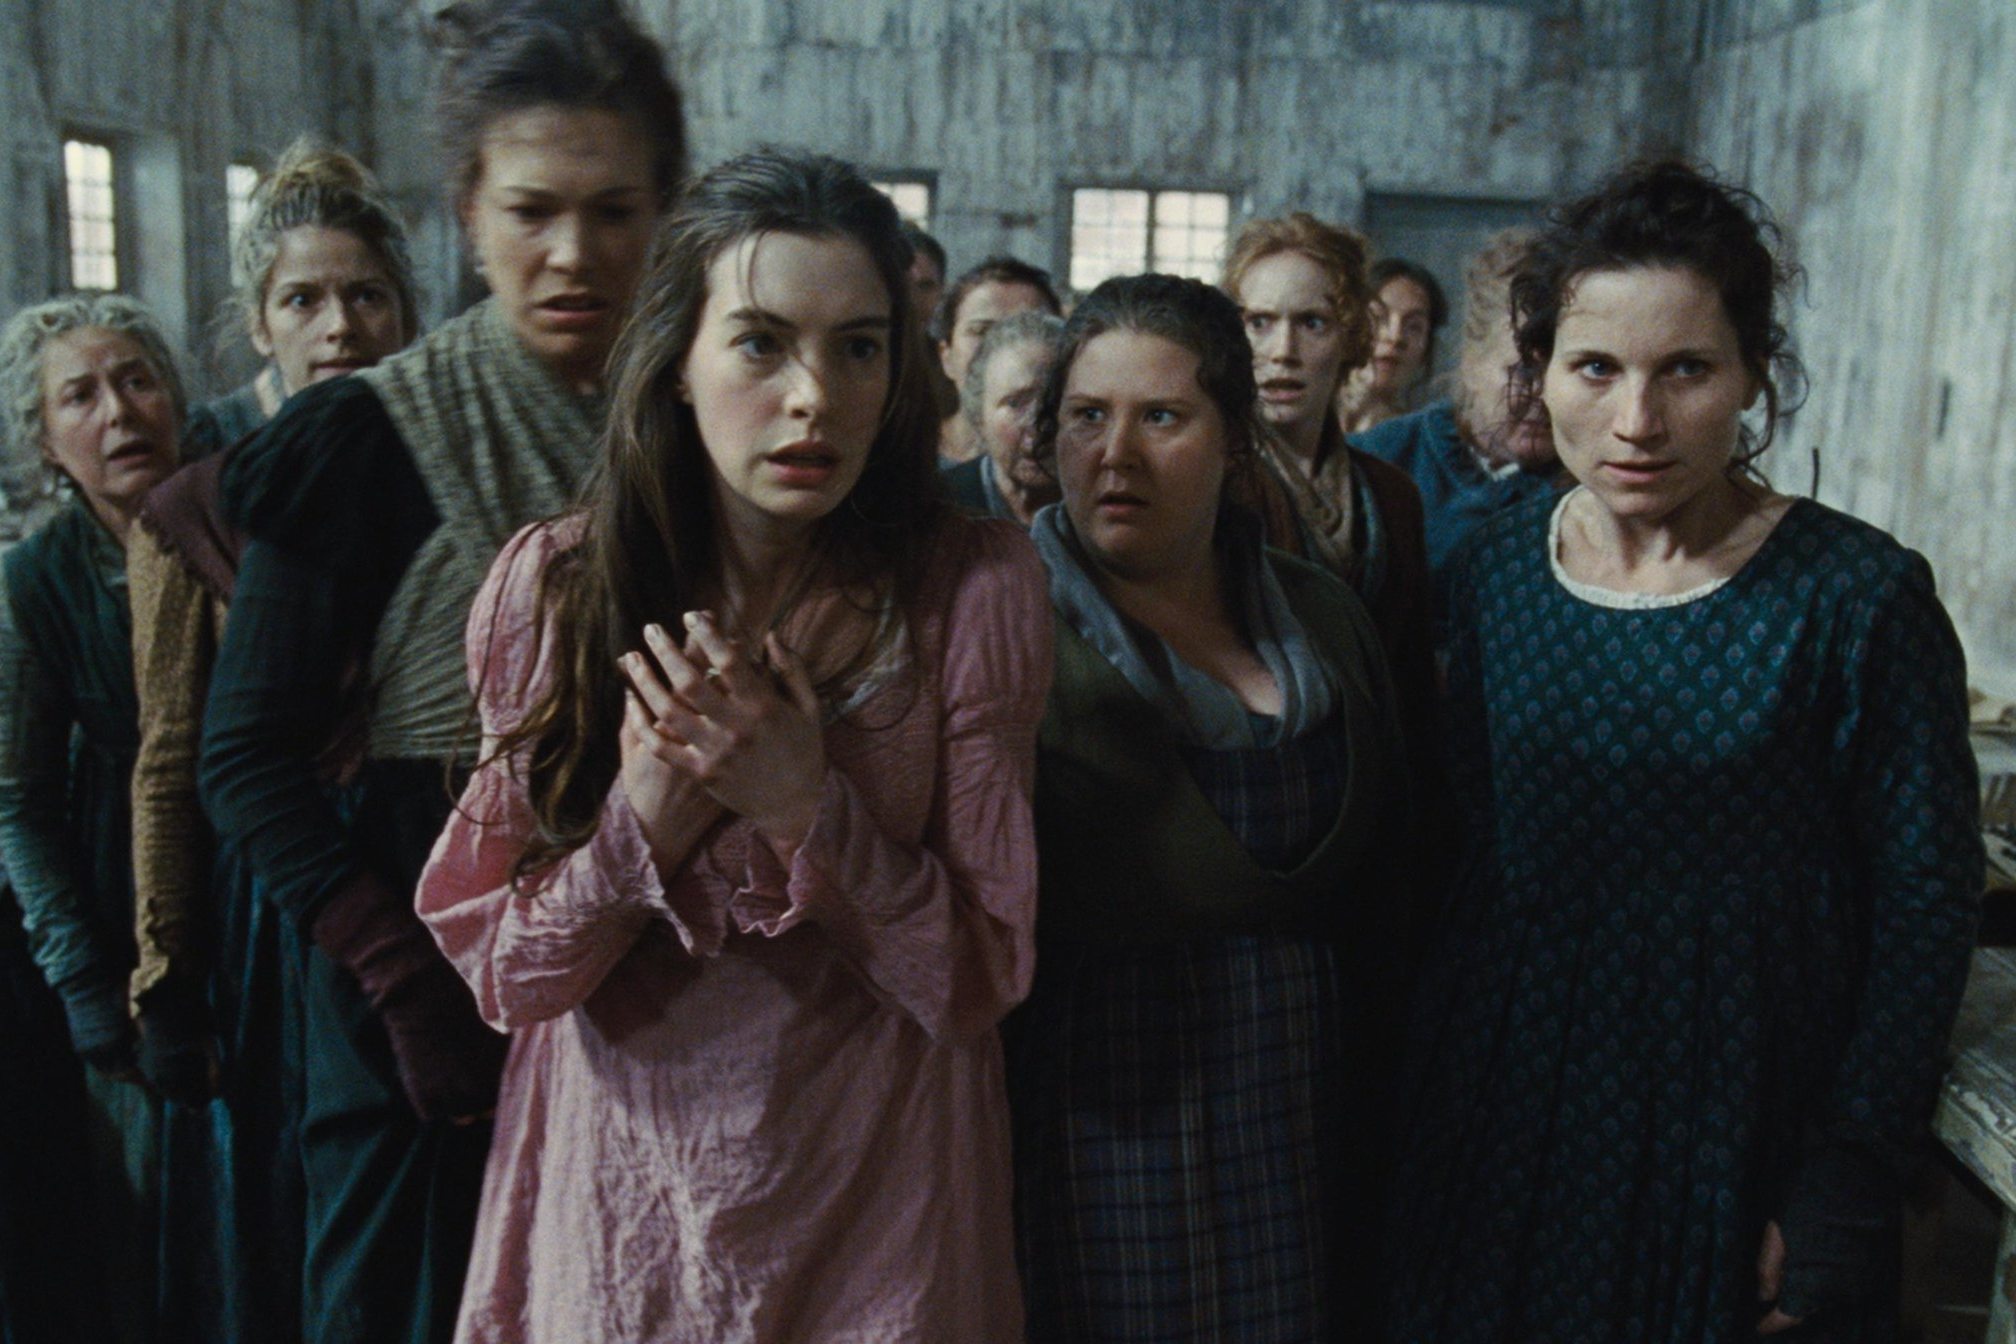 Les Misérables (2012) - Directed by:Tom HooperWritten by: William Nicholson, Alain Boublil, Claude-Michel Schönberg & Herbert Kretzmer